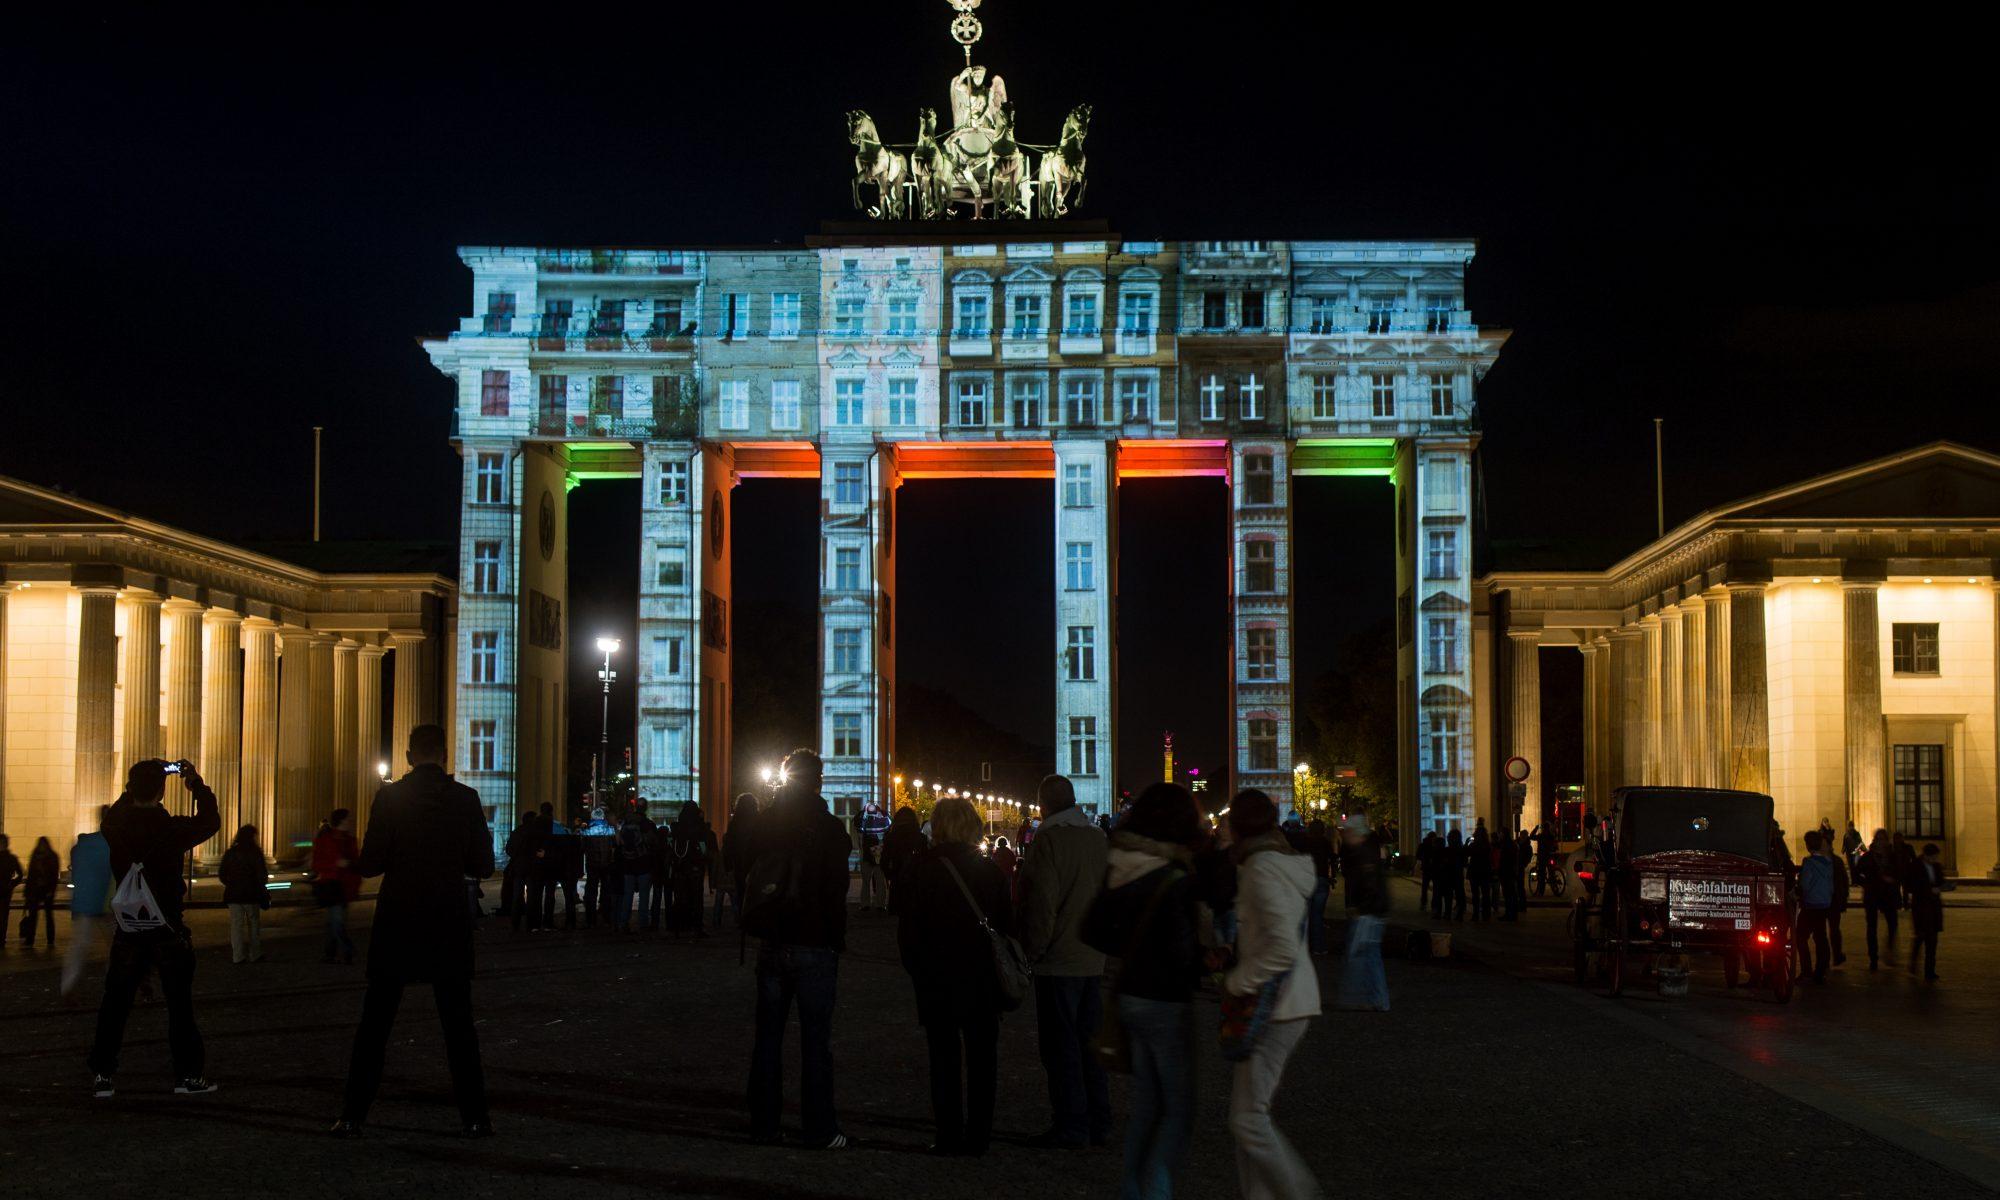 Brandenburger Tor ◆ Leben im Brandenburger Tor ◆ powered by Gilde